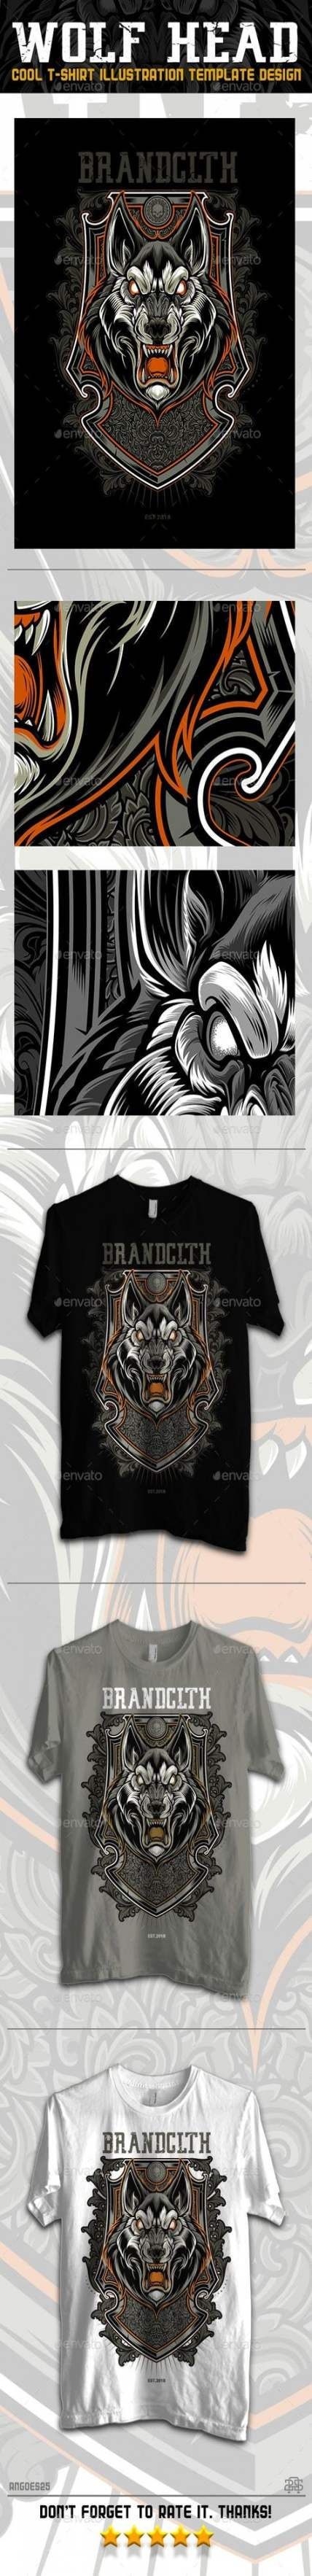 Download Trendy T Shirt Design Illustration Deviantart Ideas T Shirt Design Template Tshirt Designs Design Template